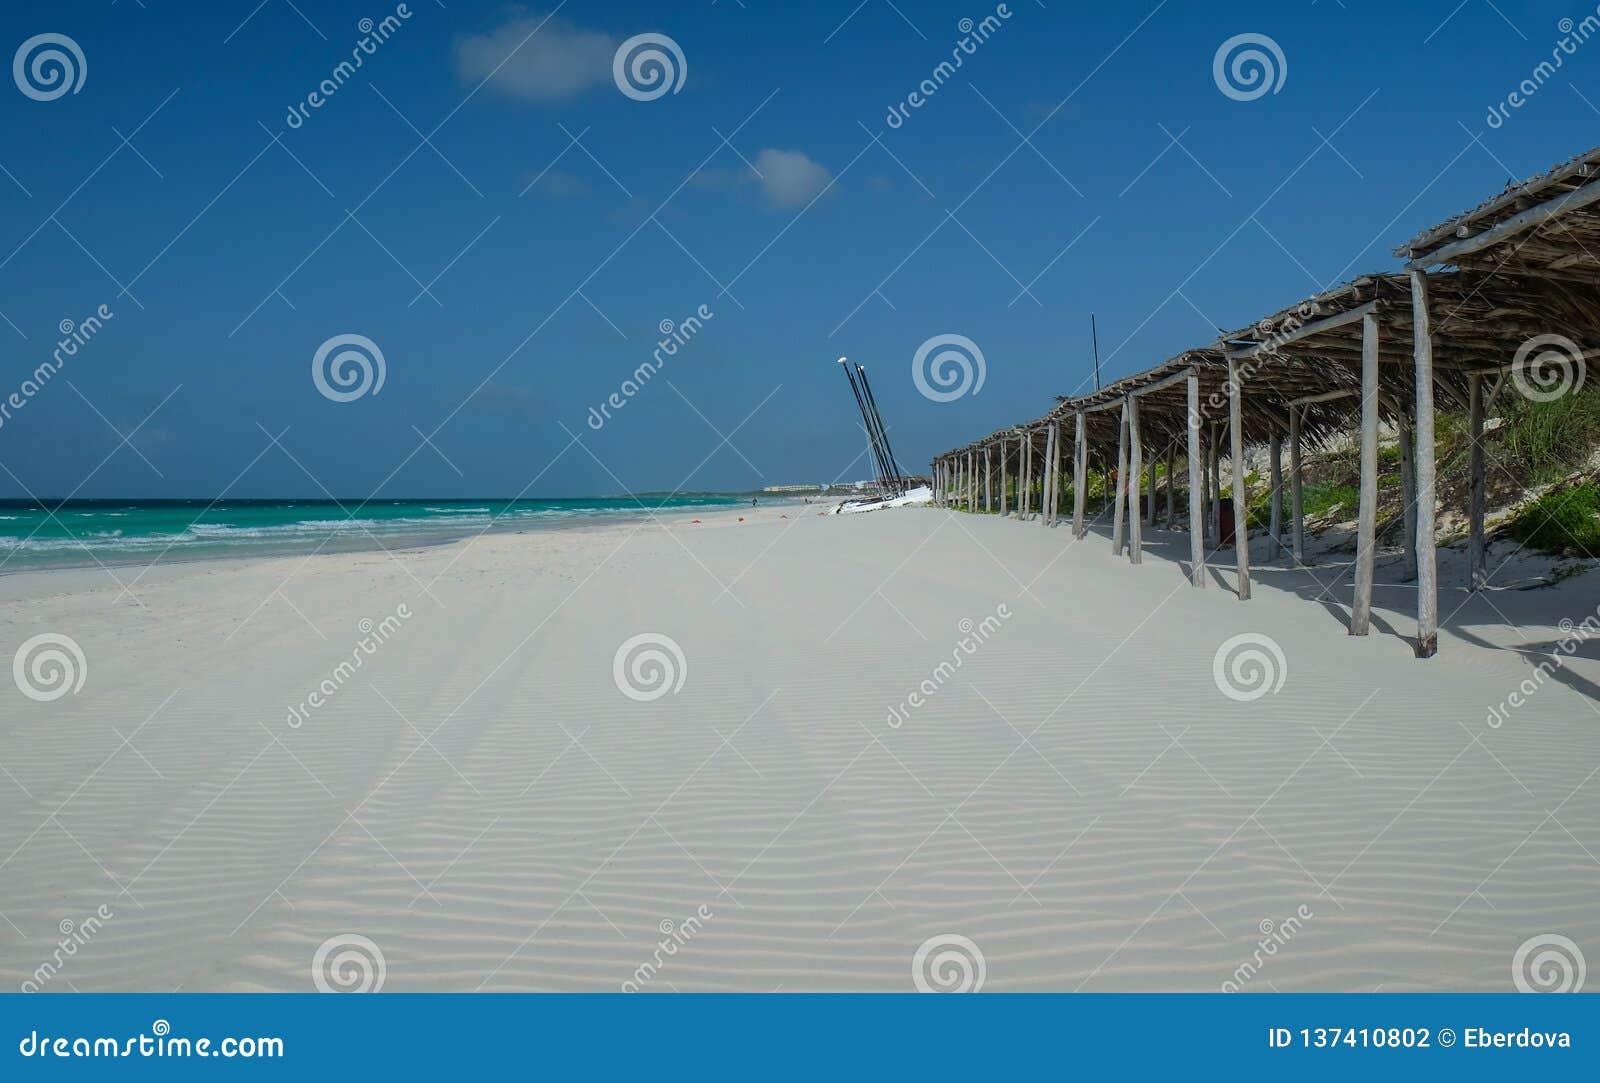 Low tide at endless white sand Cuban beach.